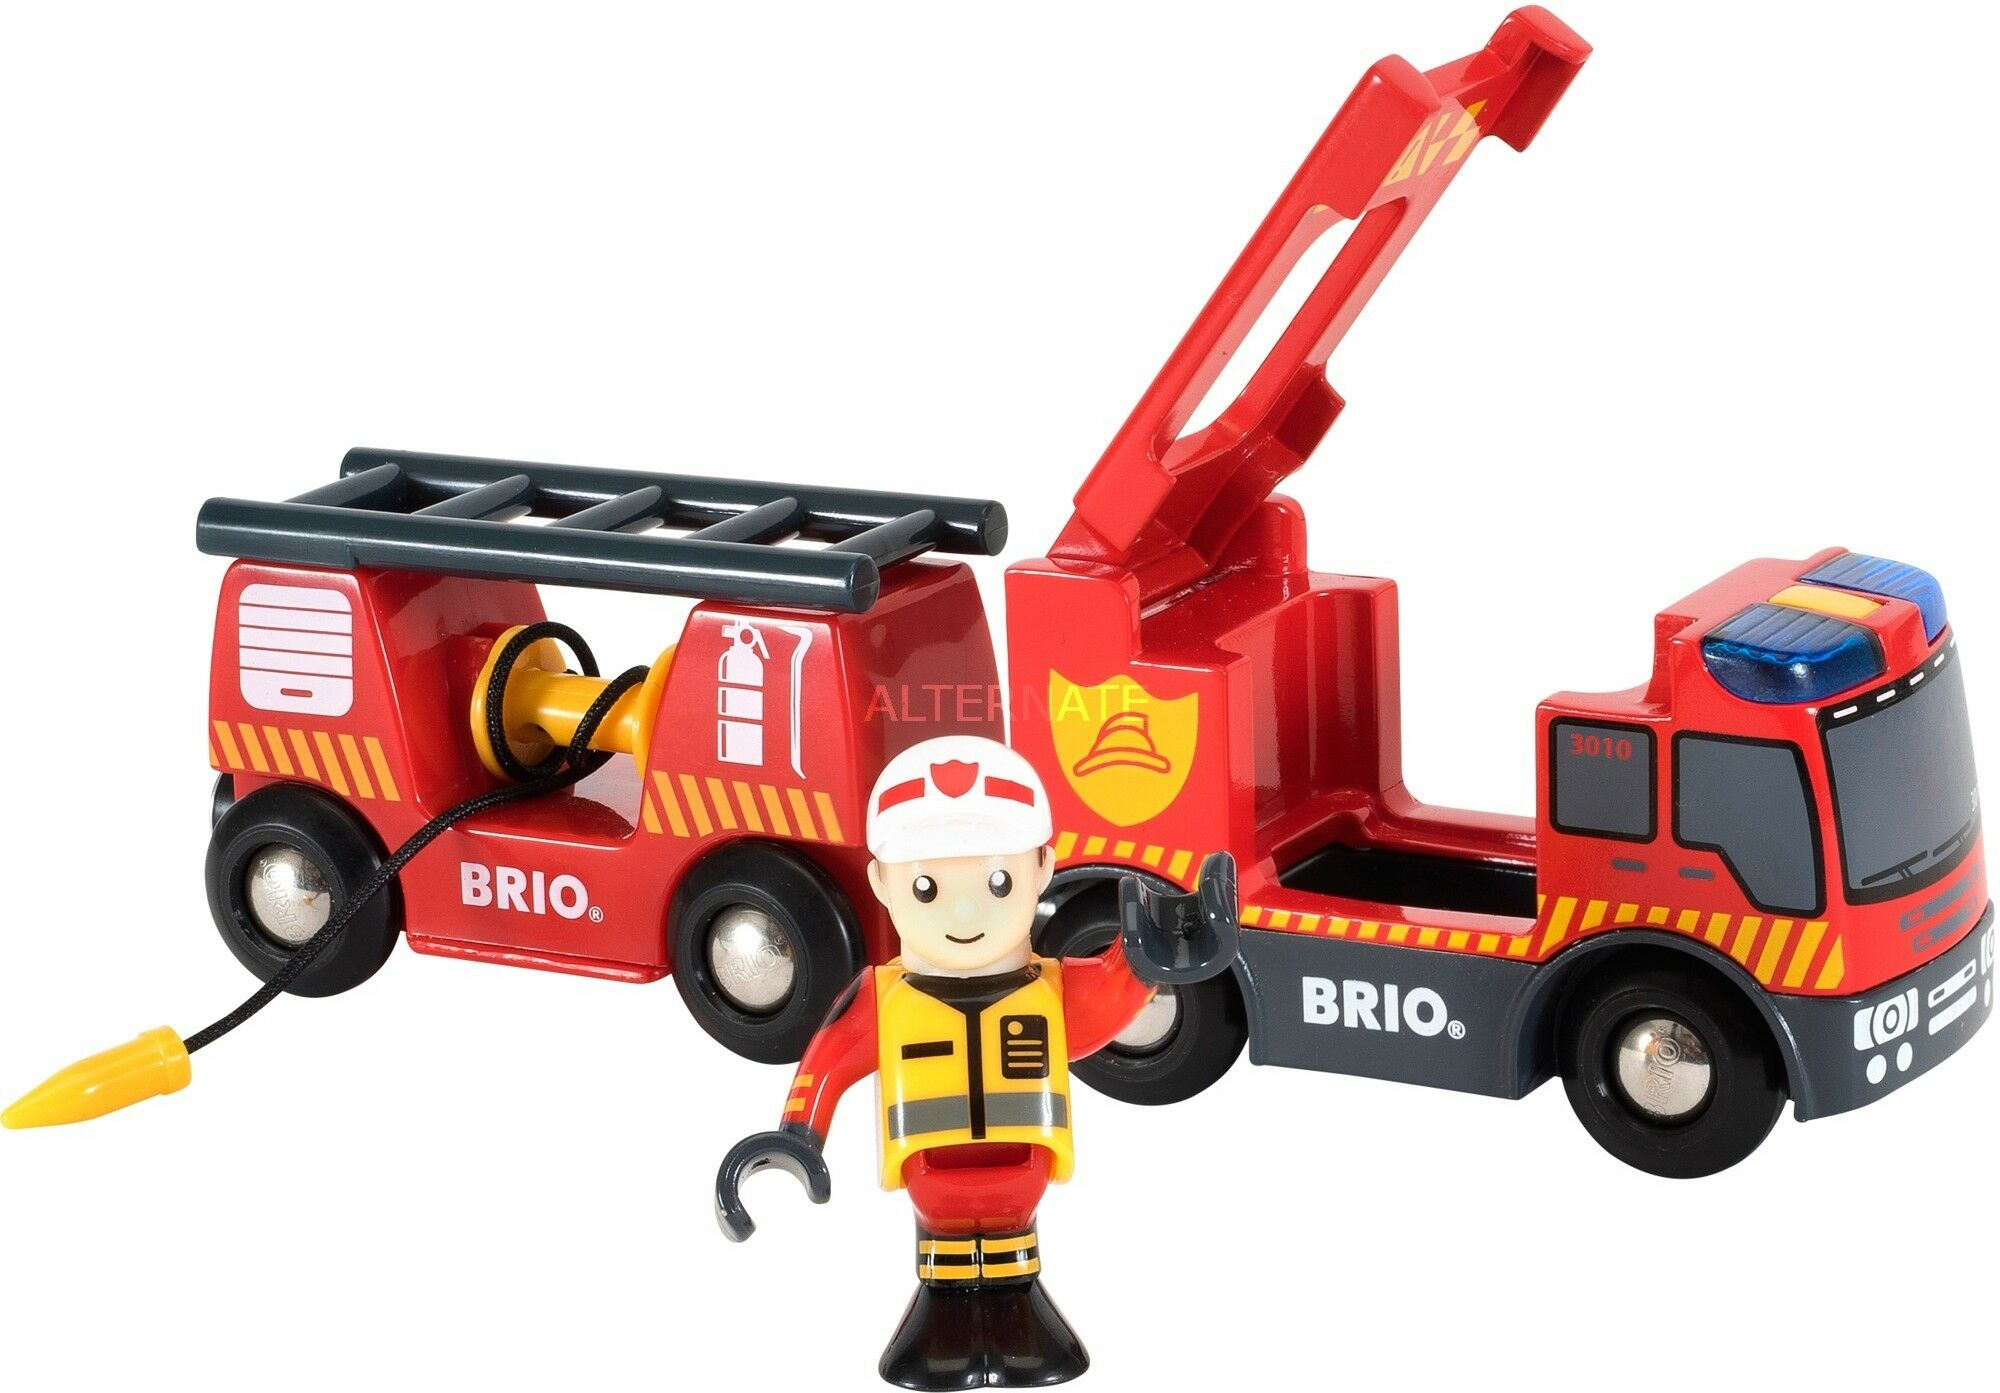 BRIO - Brio World Wóz Strażacki